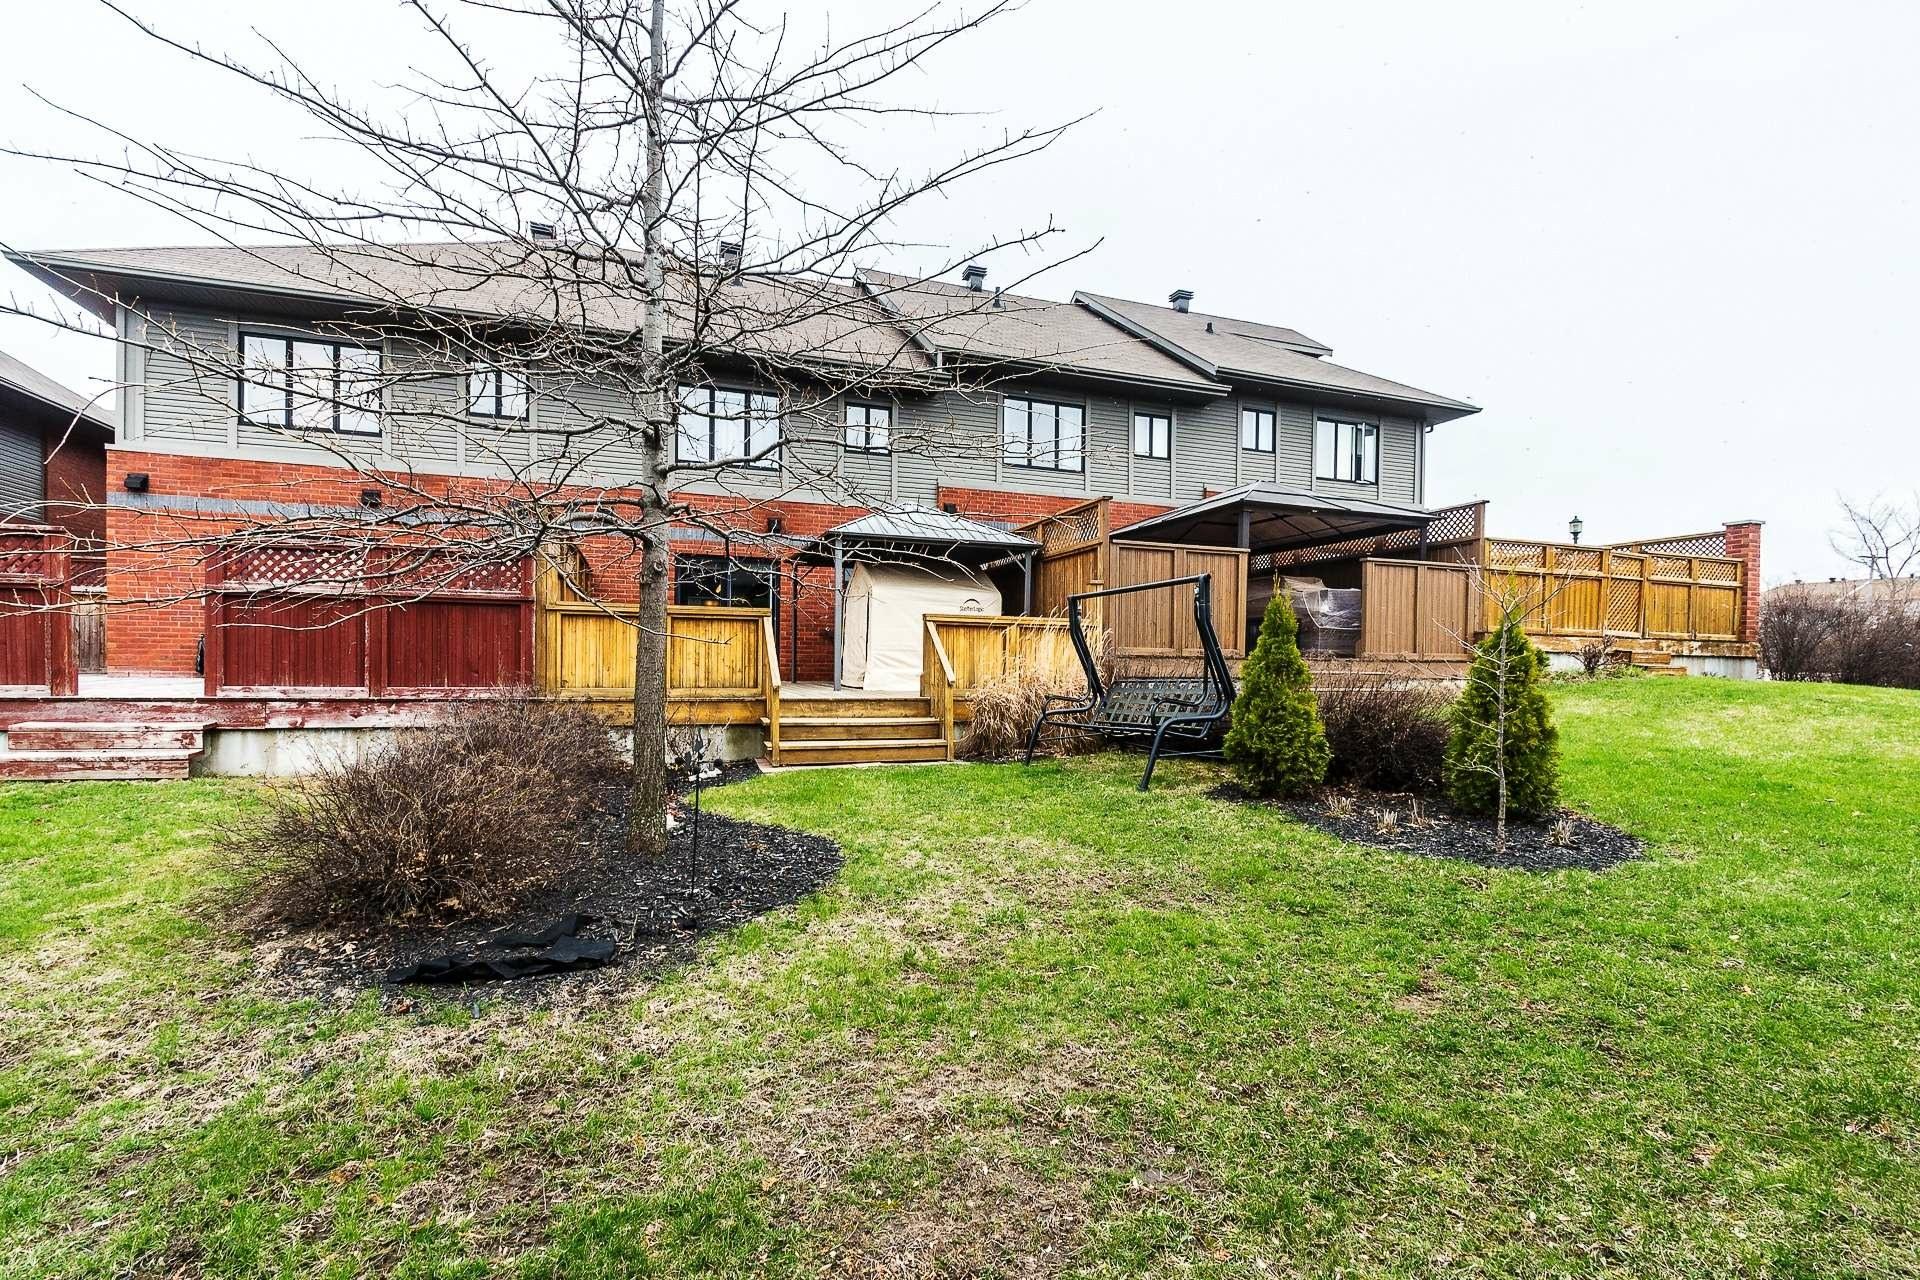 image 27 - MX - Casa sola - MX En venta Montréal Lachine  - 8 habitaciones